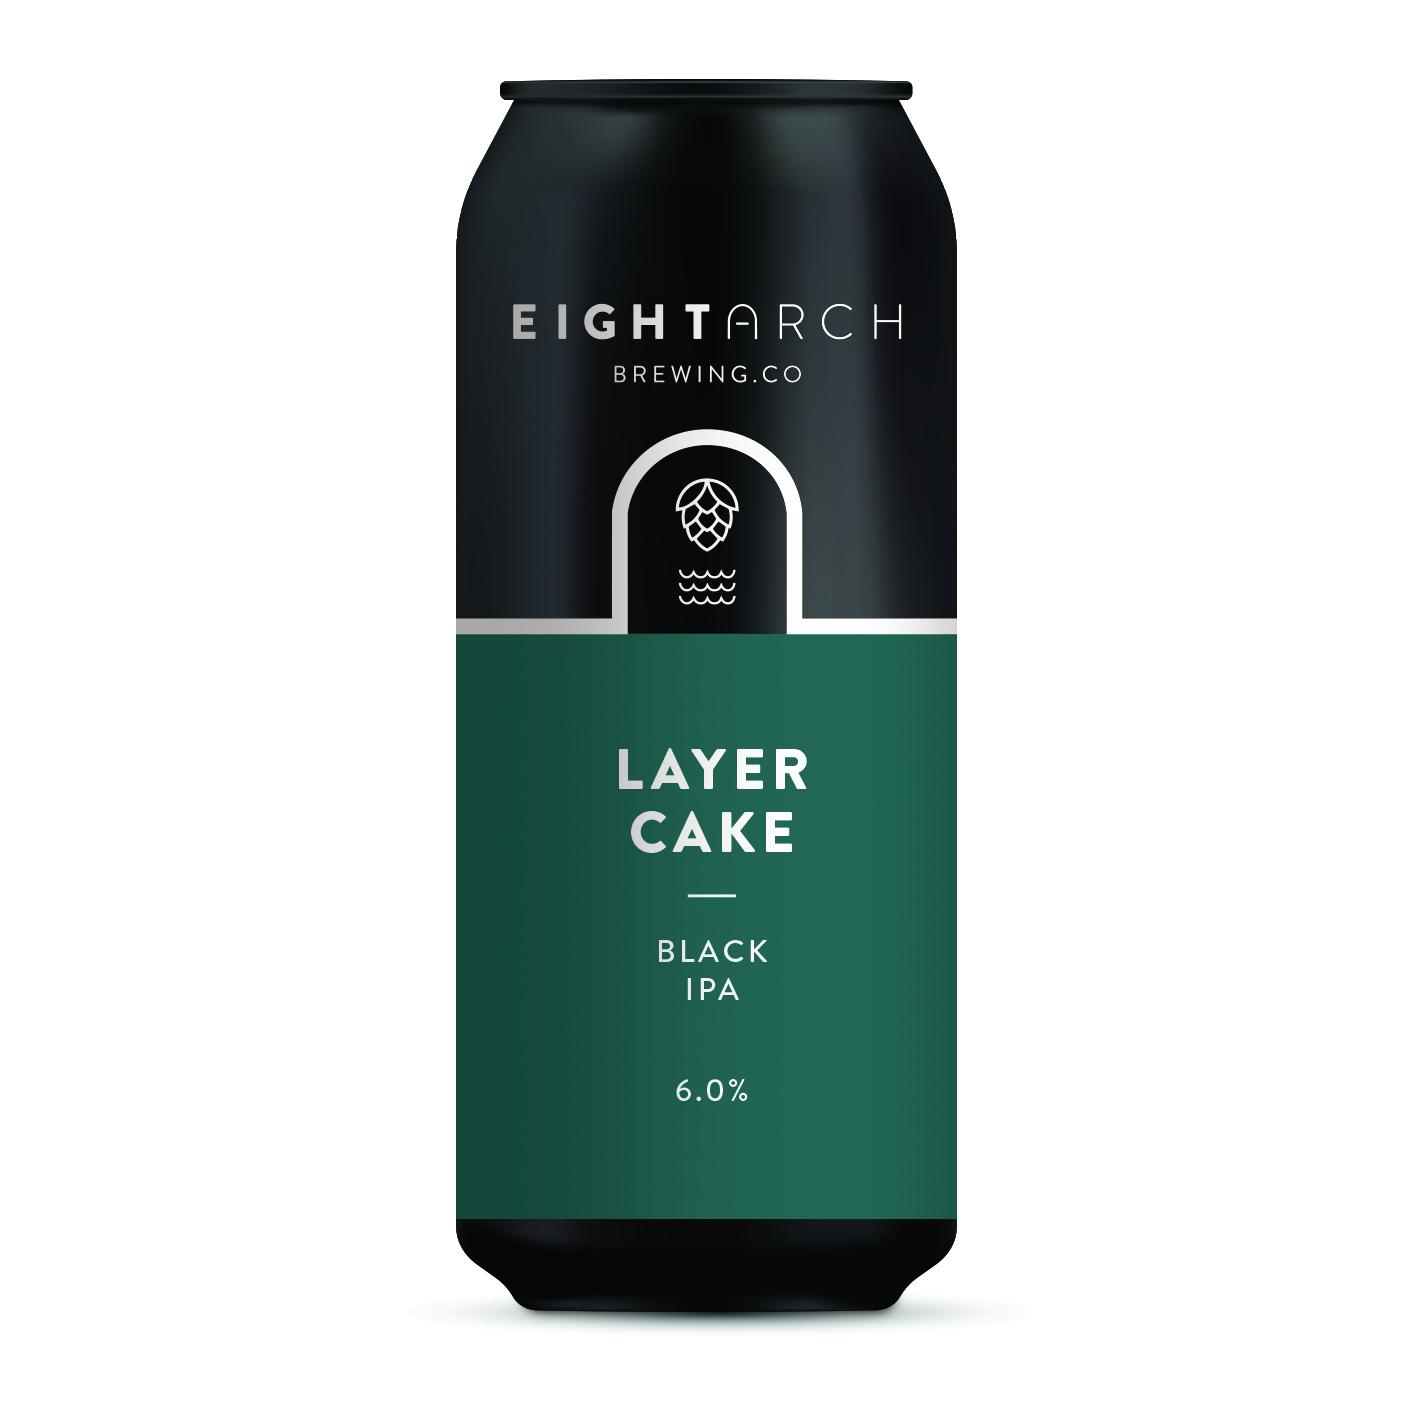 https://www.8archbrewing.co.uk/wp-content/uploads/2021/03/Layer-Cake-440ml.jpg